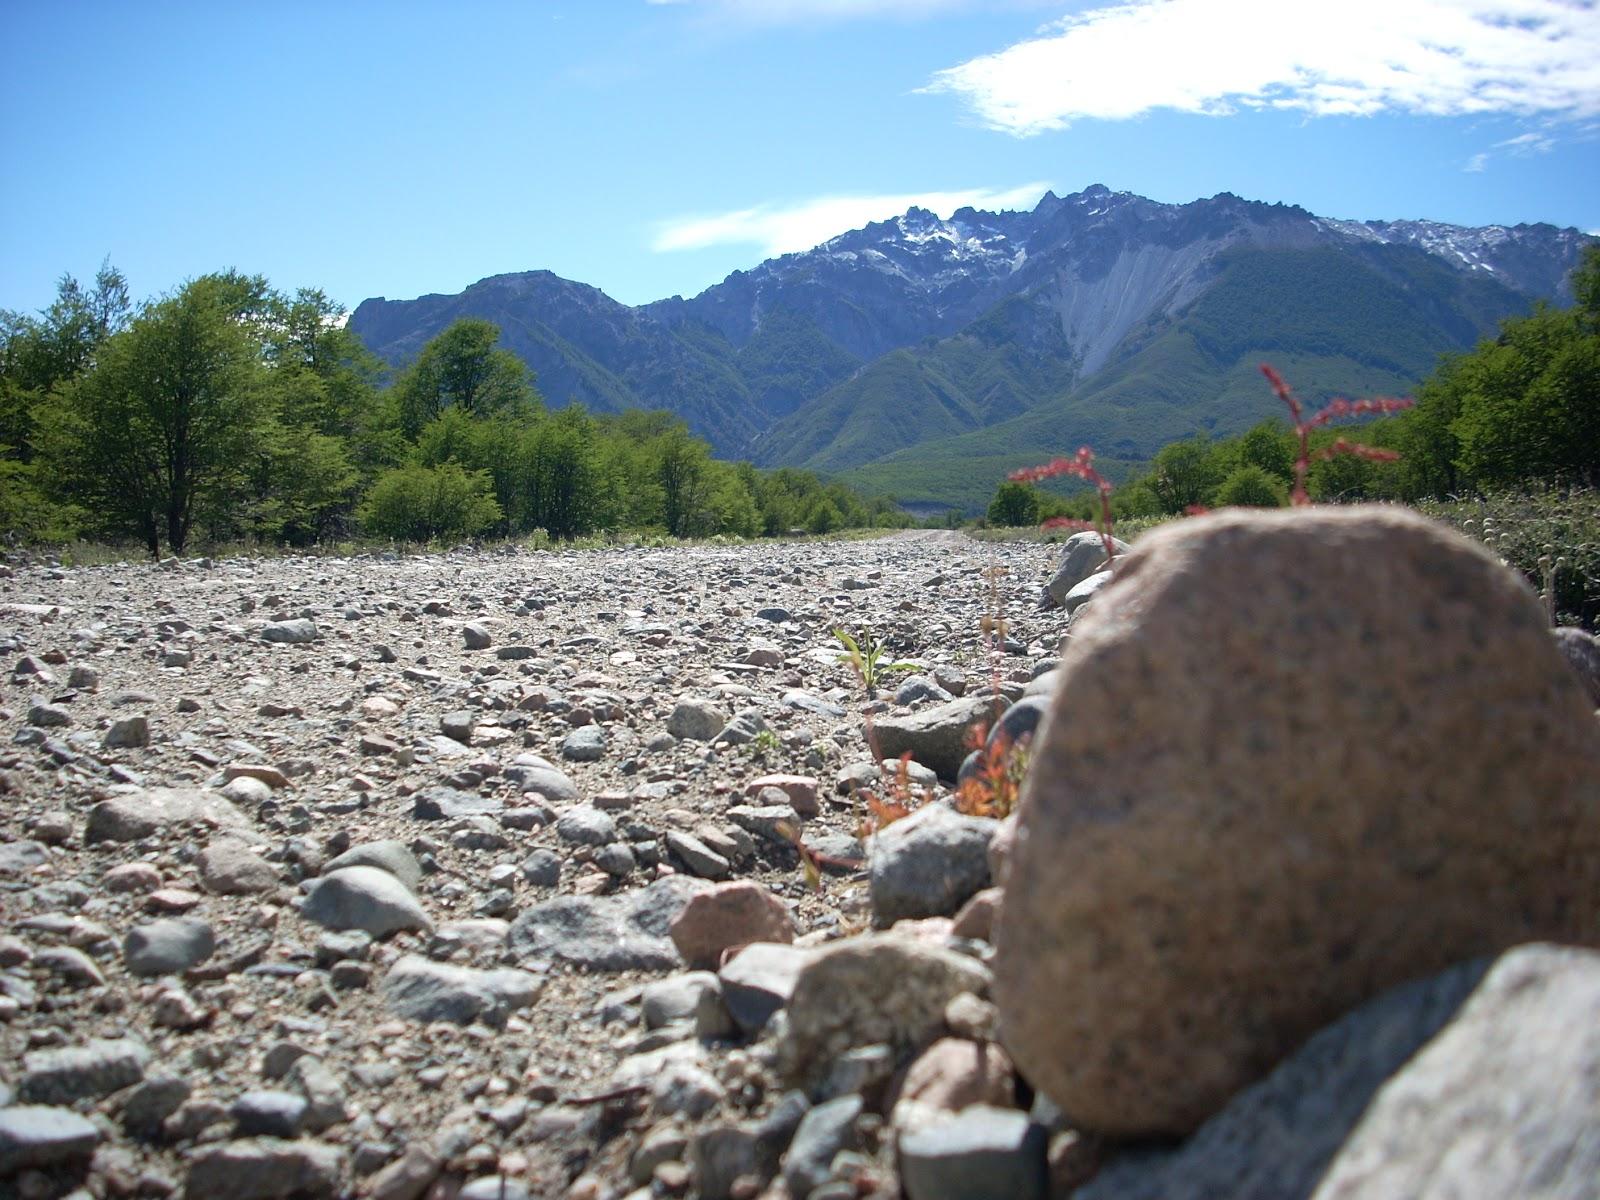 Big loose rocks == no fun for riding